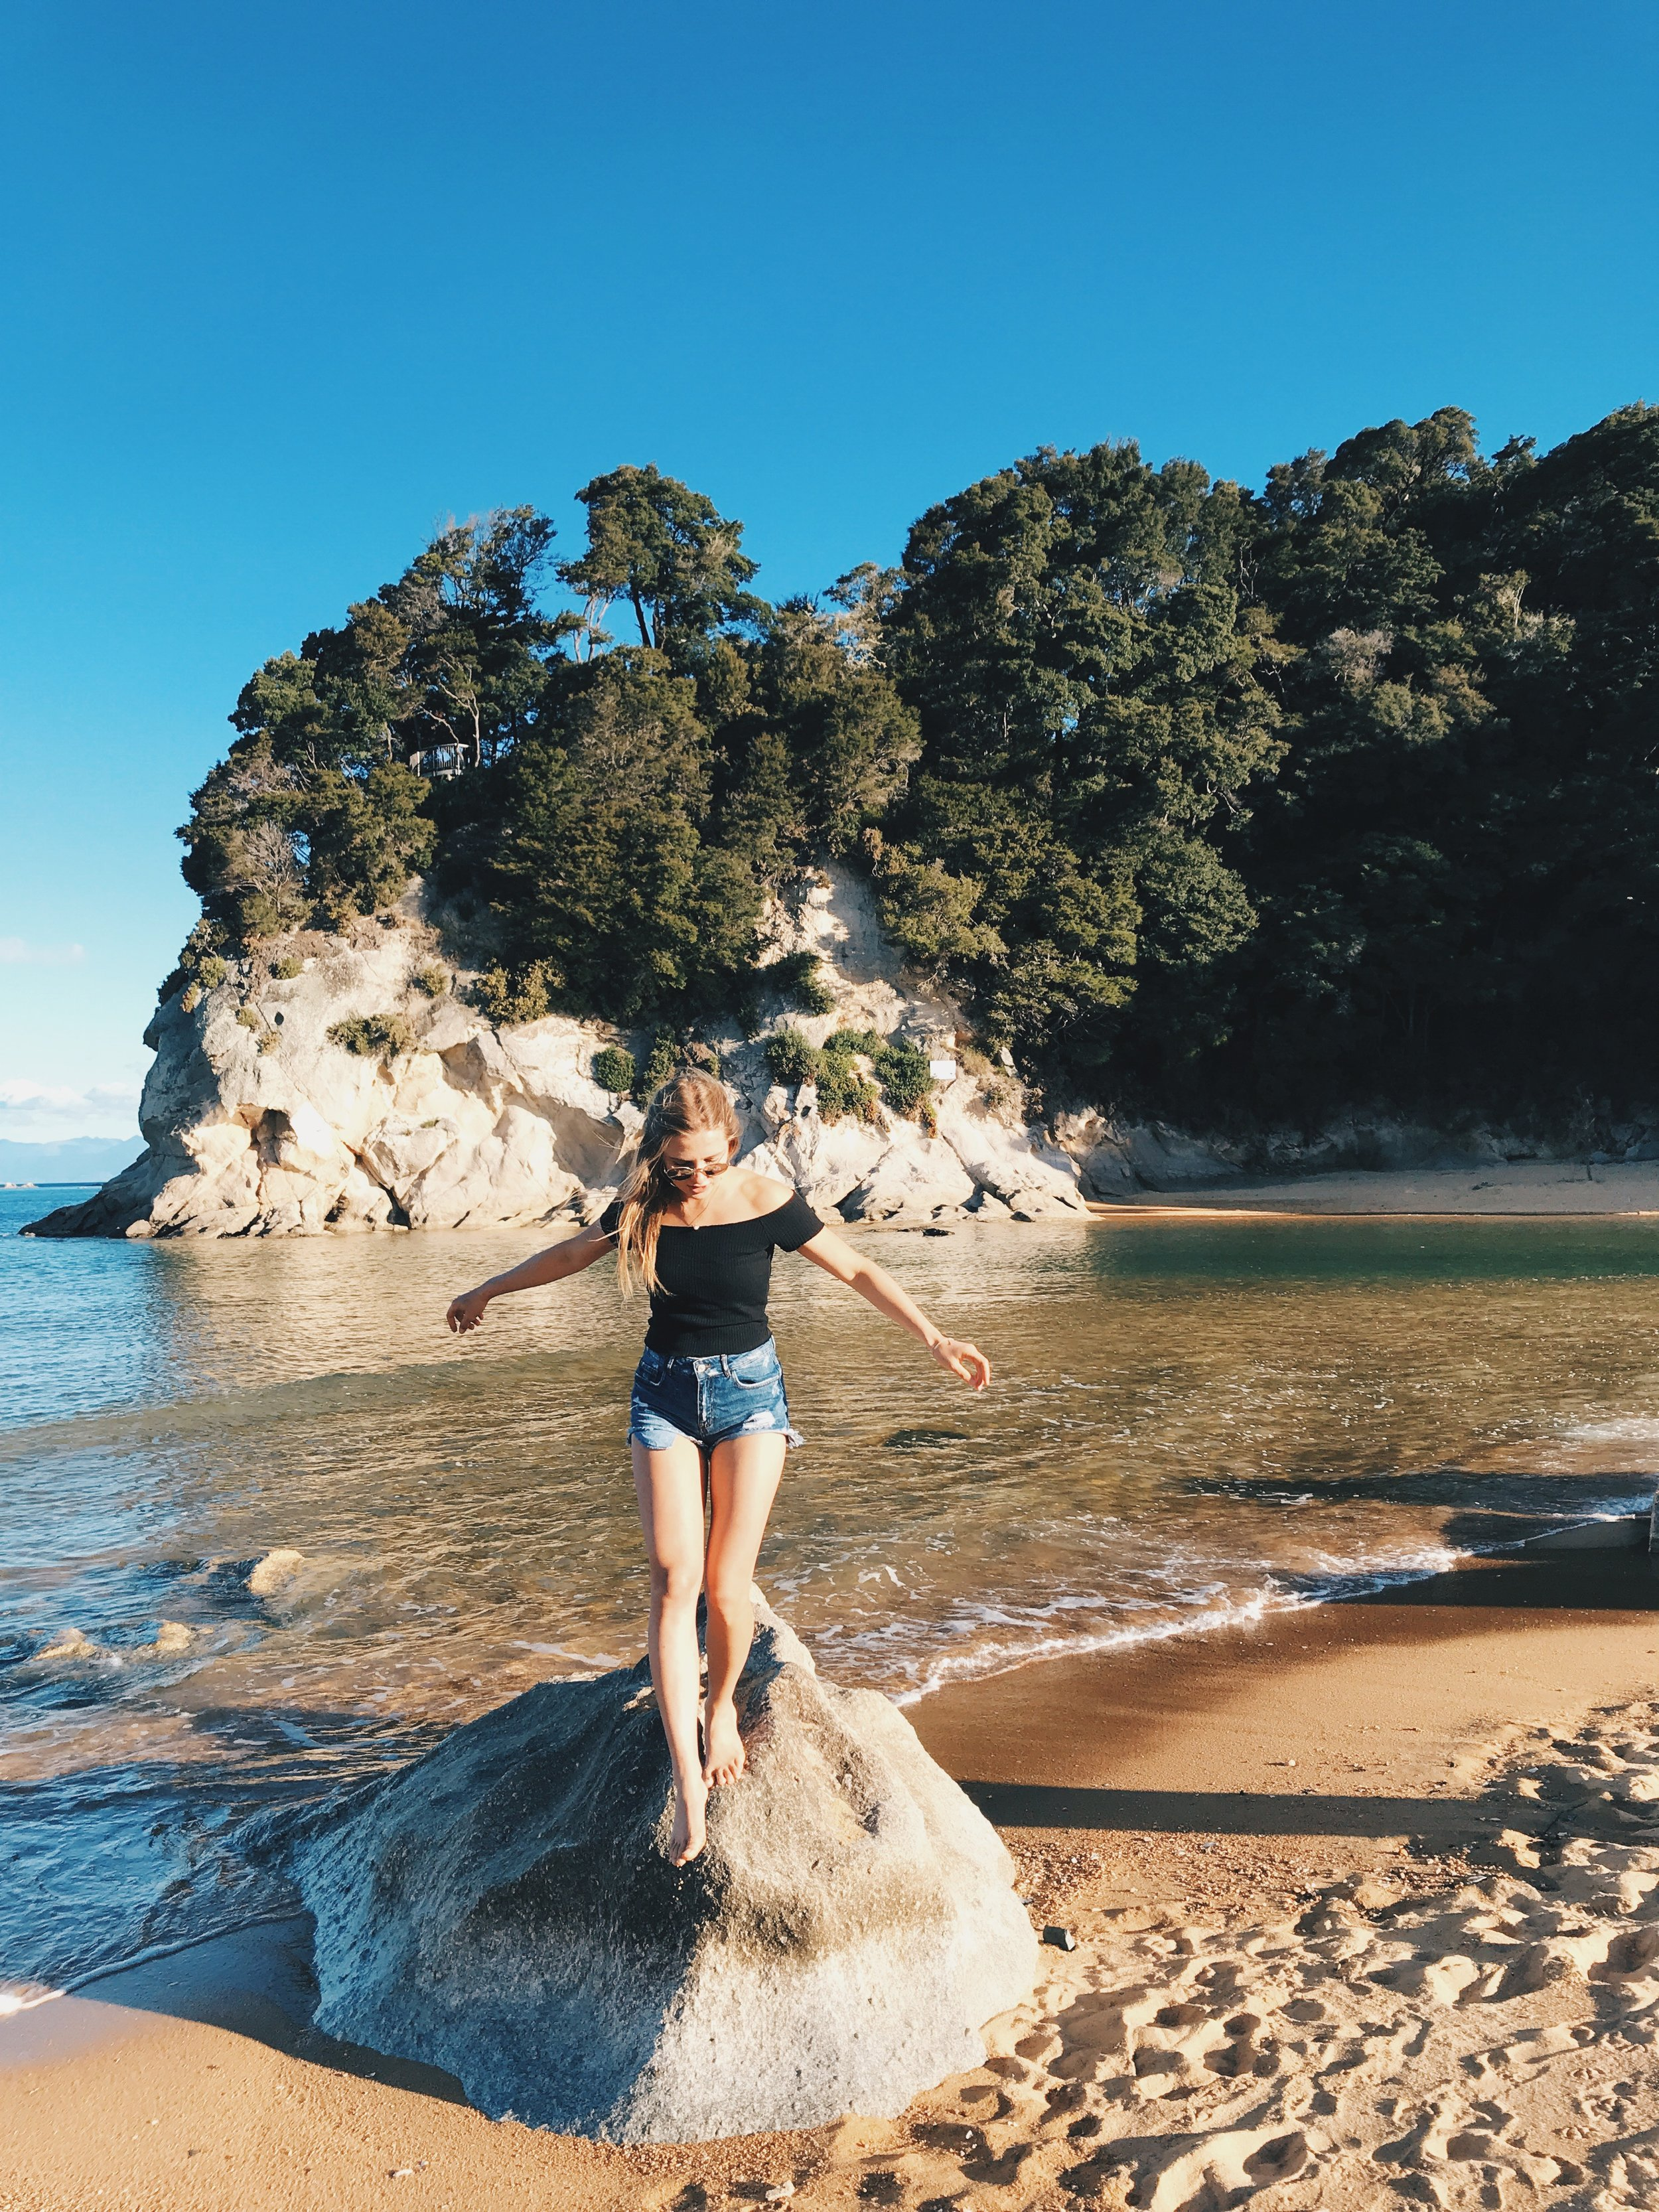 abeltasman-nationalpark-newzealand-southisland-kiwiexperience-gretacaptures